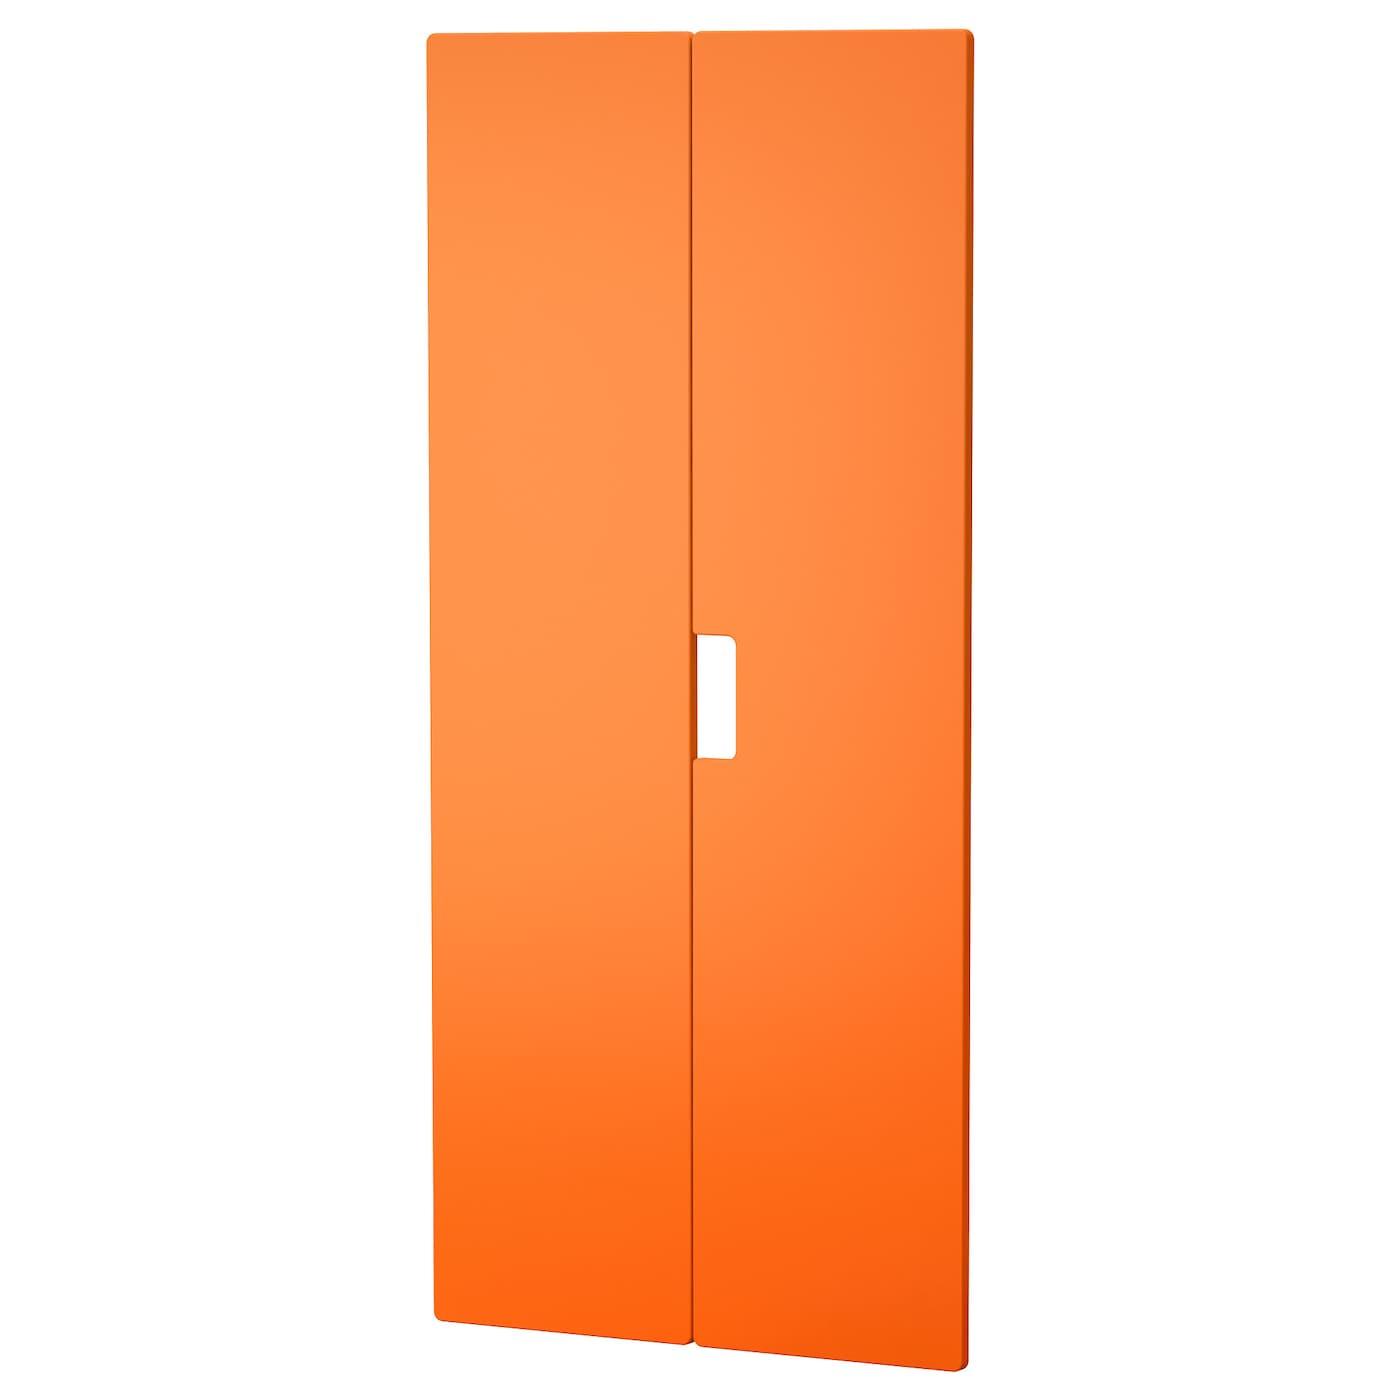 stuva m lad porte orange 60x128 cm ikea. Black Bedroom Furniture Sets. Home Design Ideas